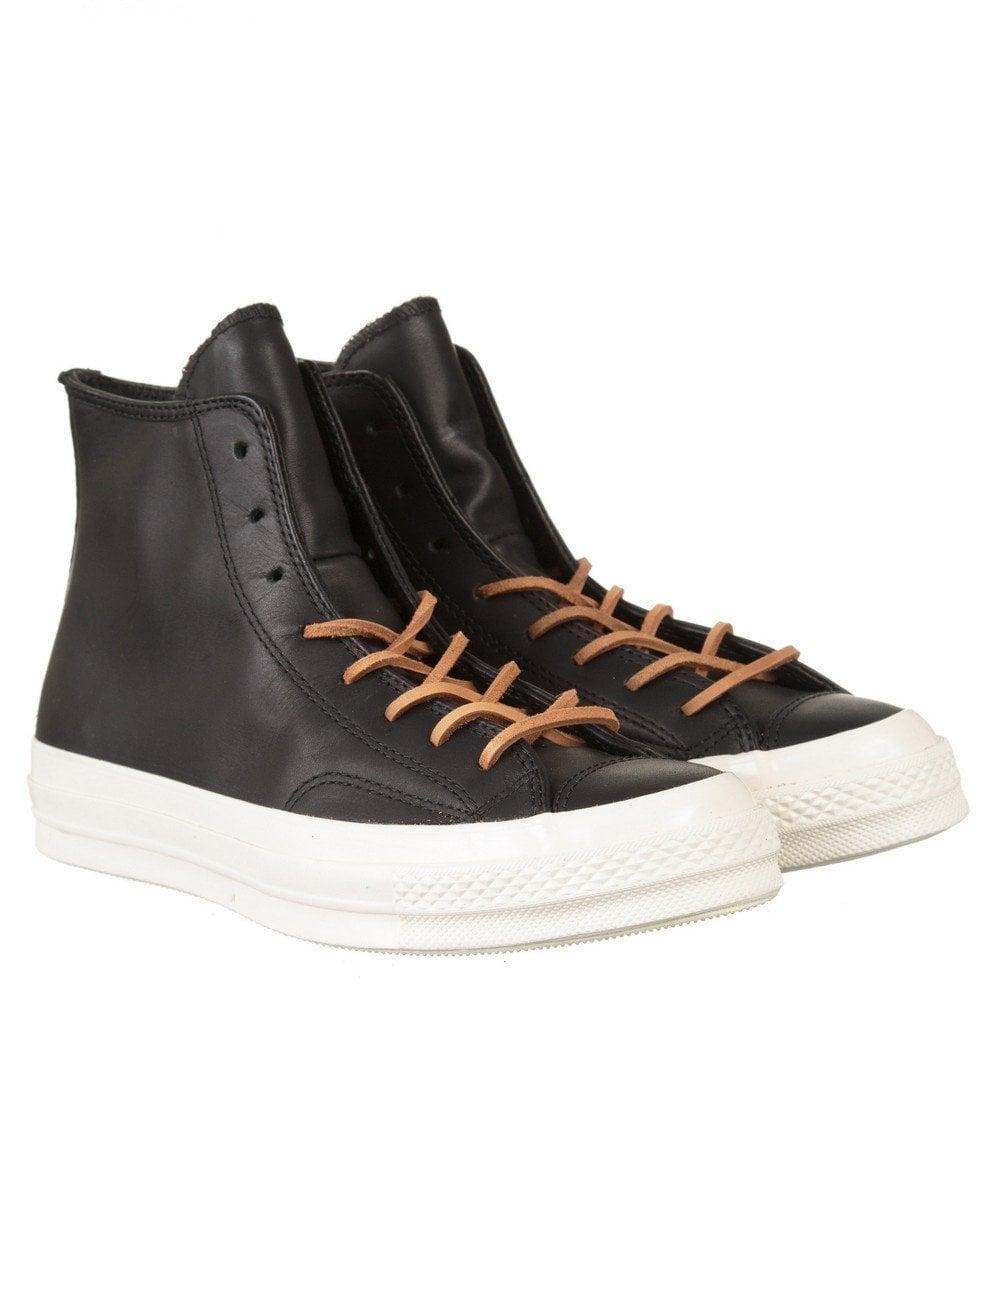 converse 70s. chuck taylor 70s hi leather boots - black/egret converse